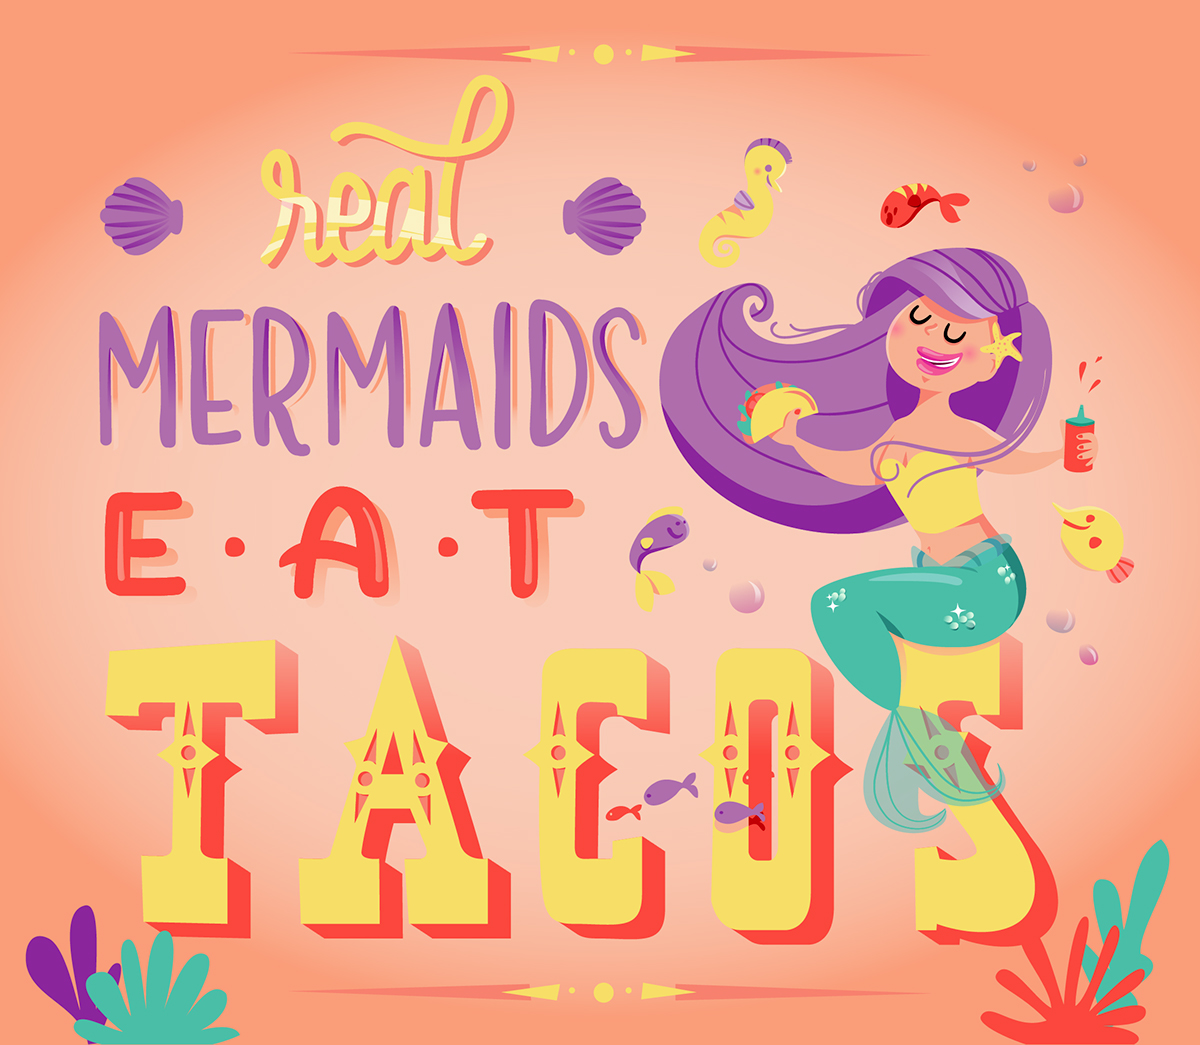 Real mermaids eat tacos